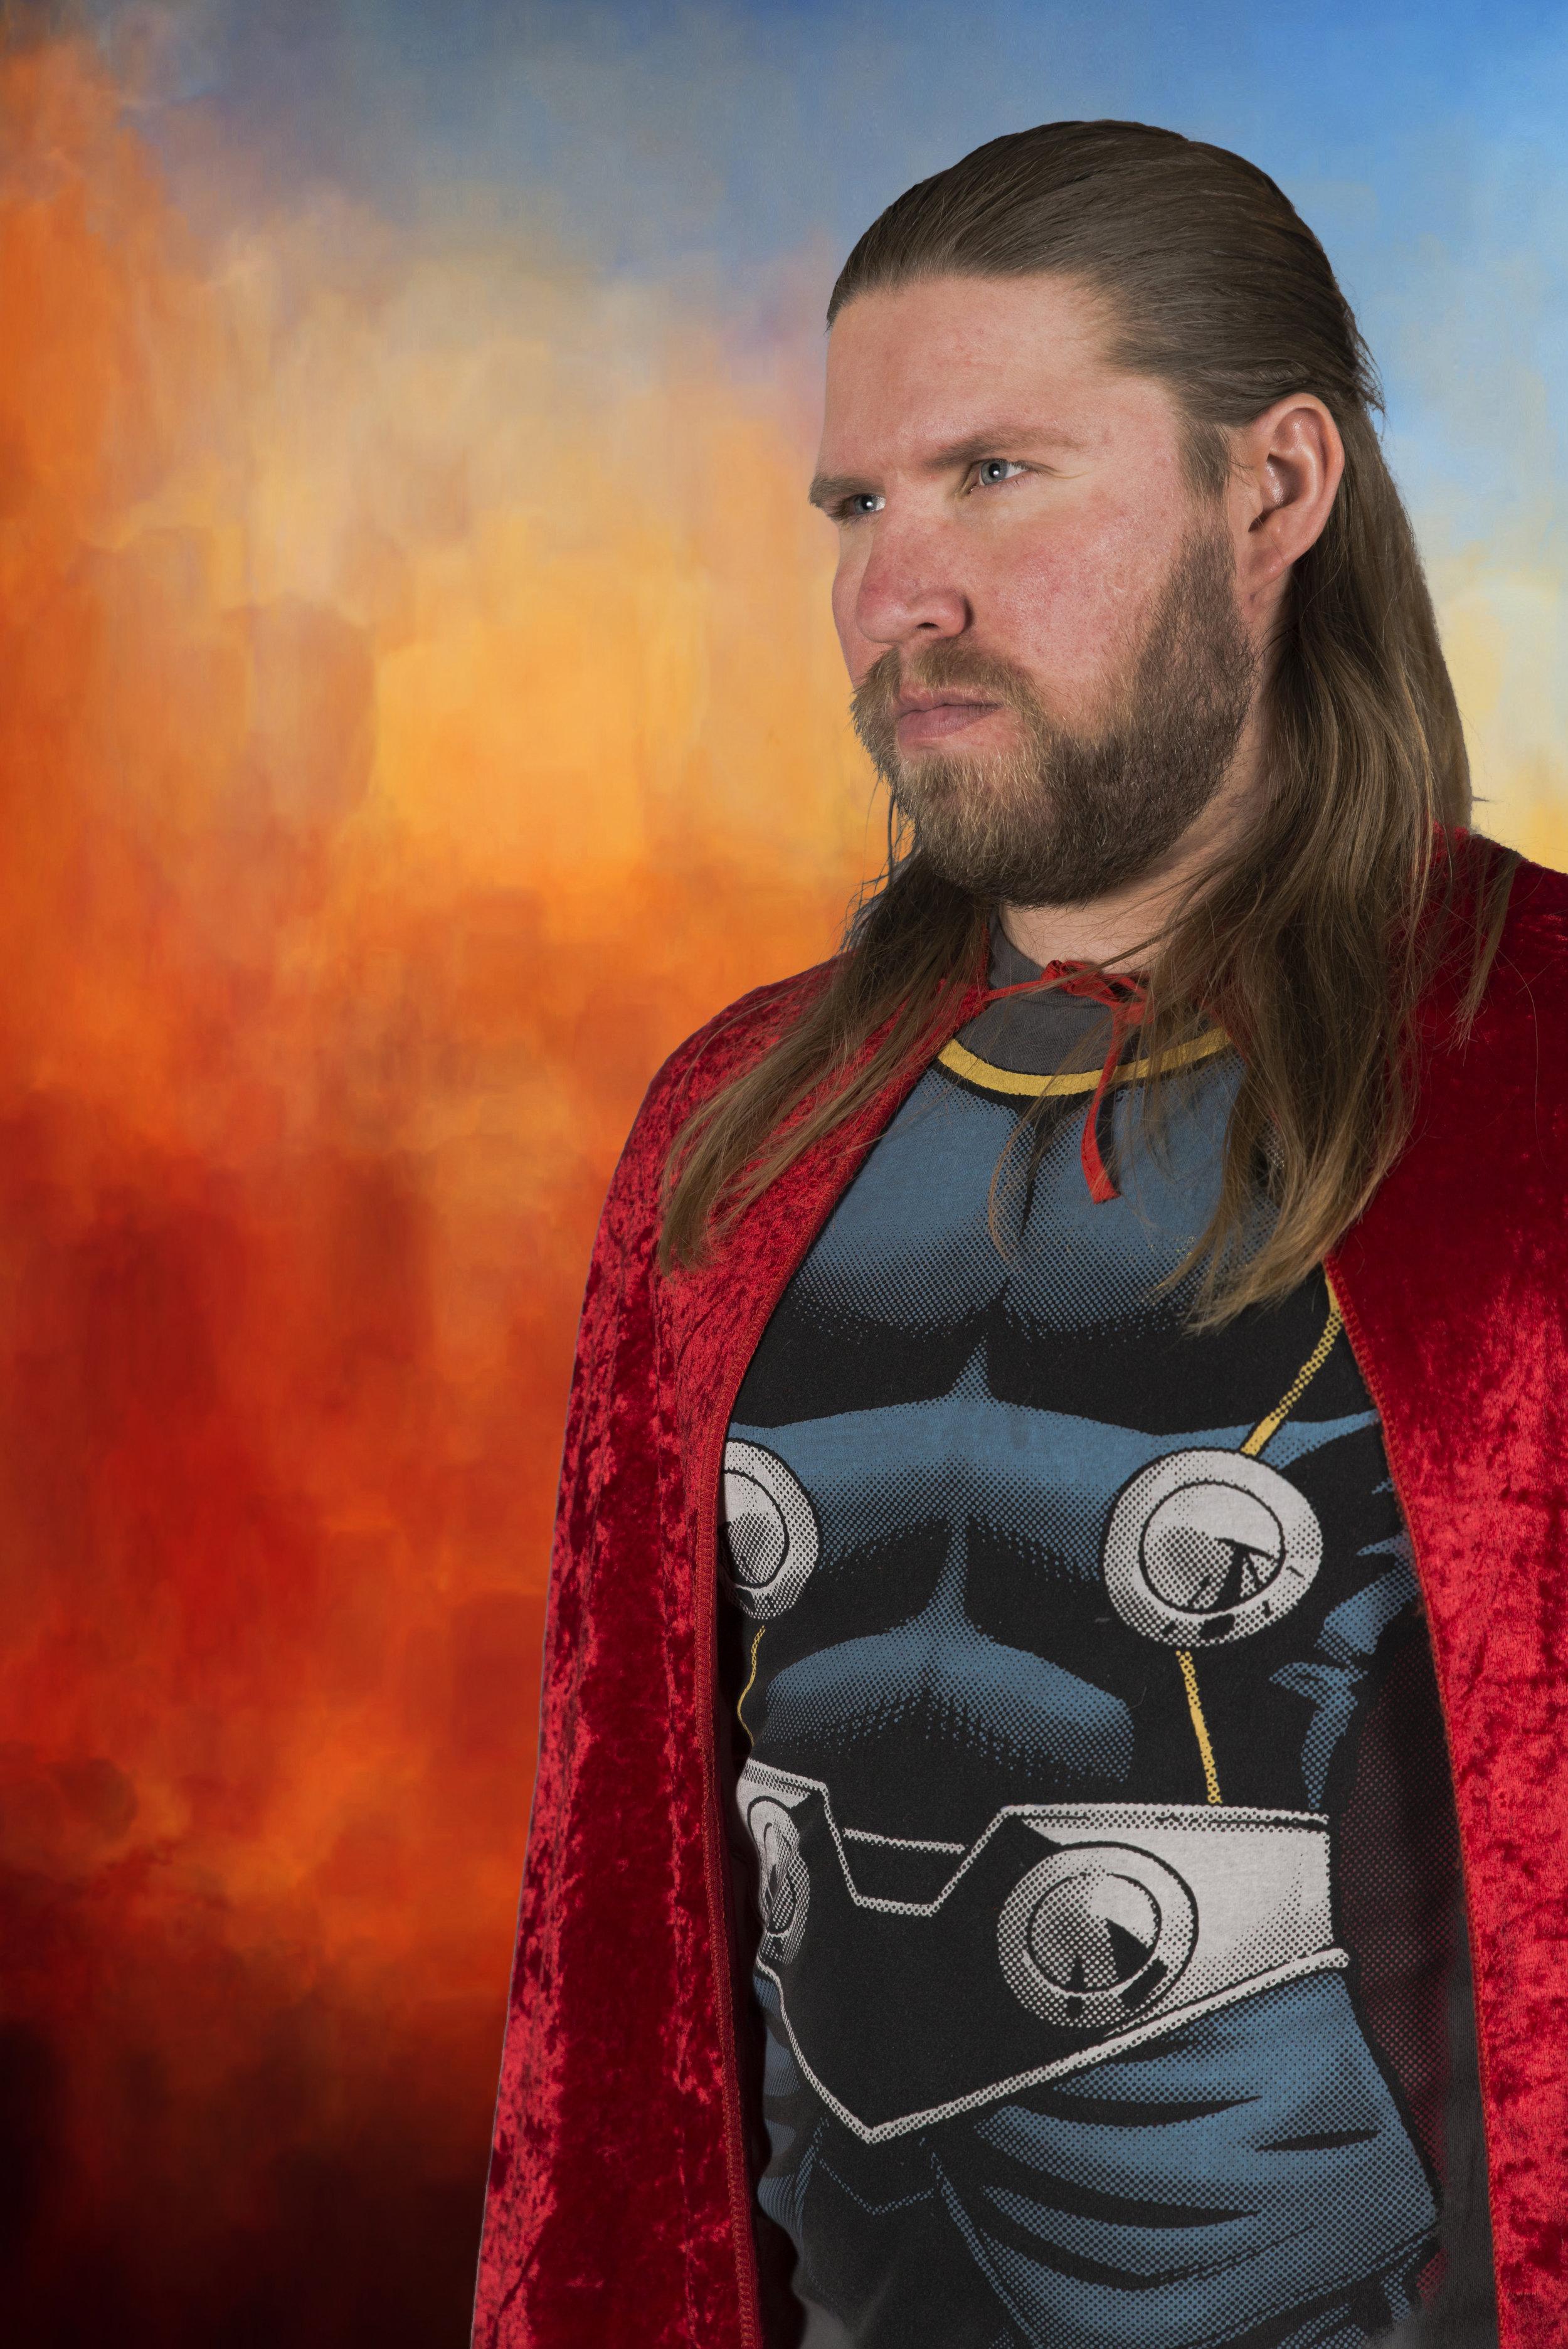 Thor-portrait-session2.jpg